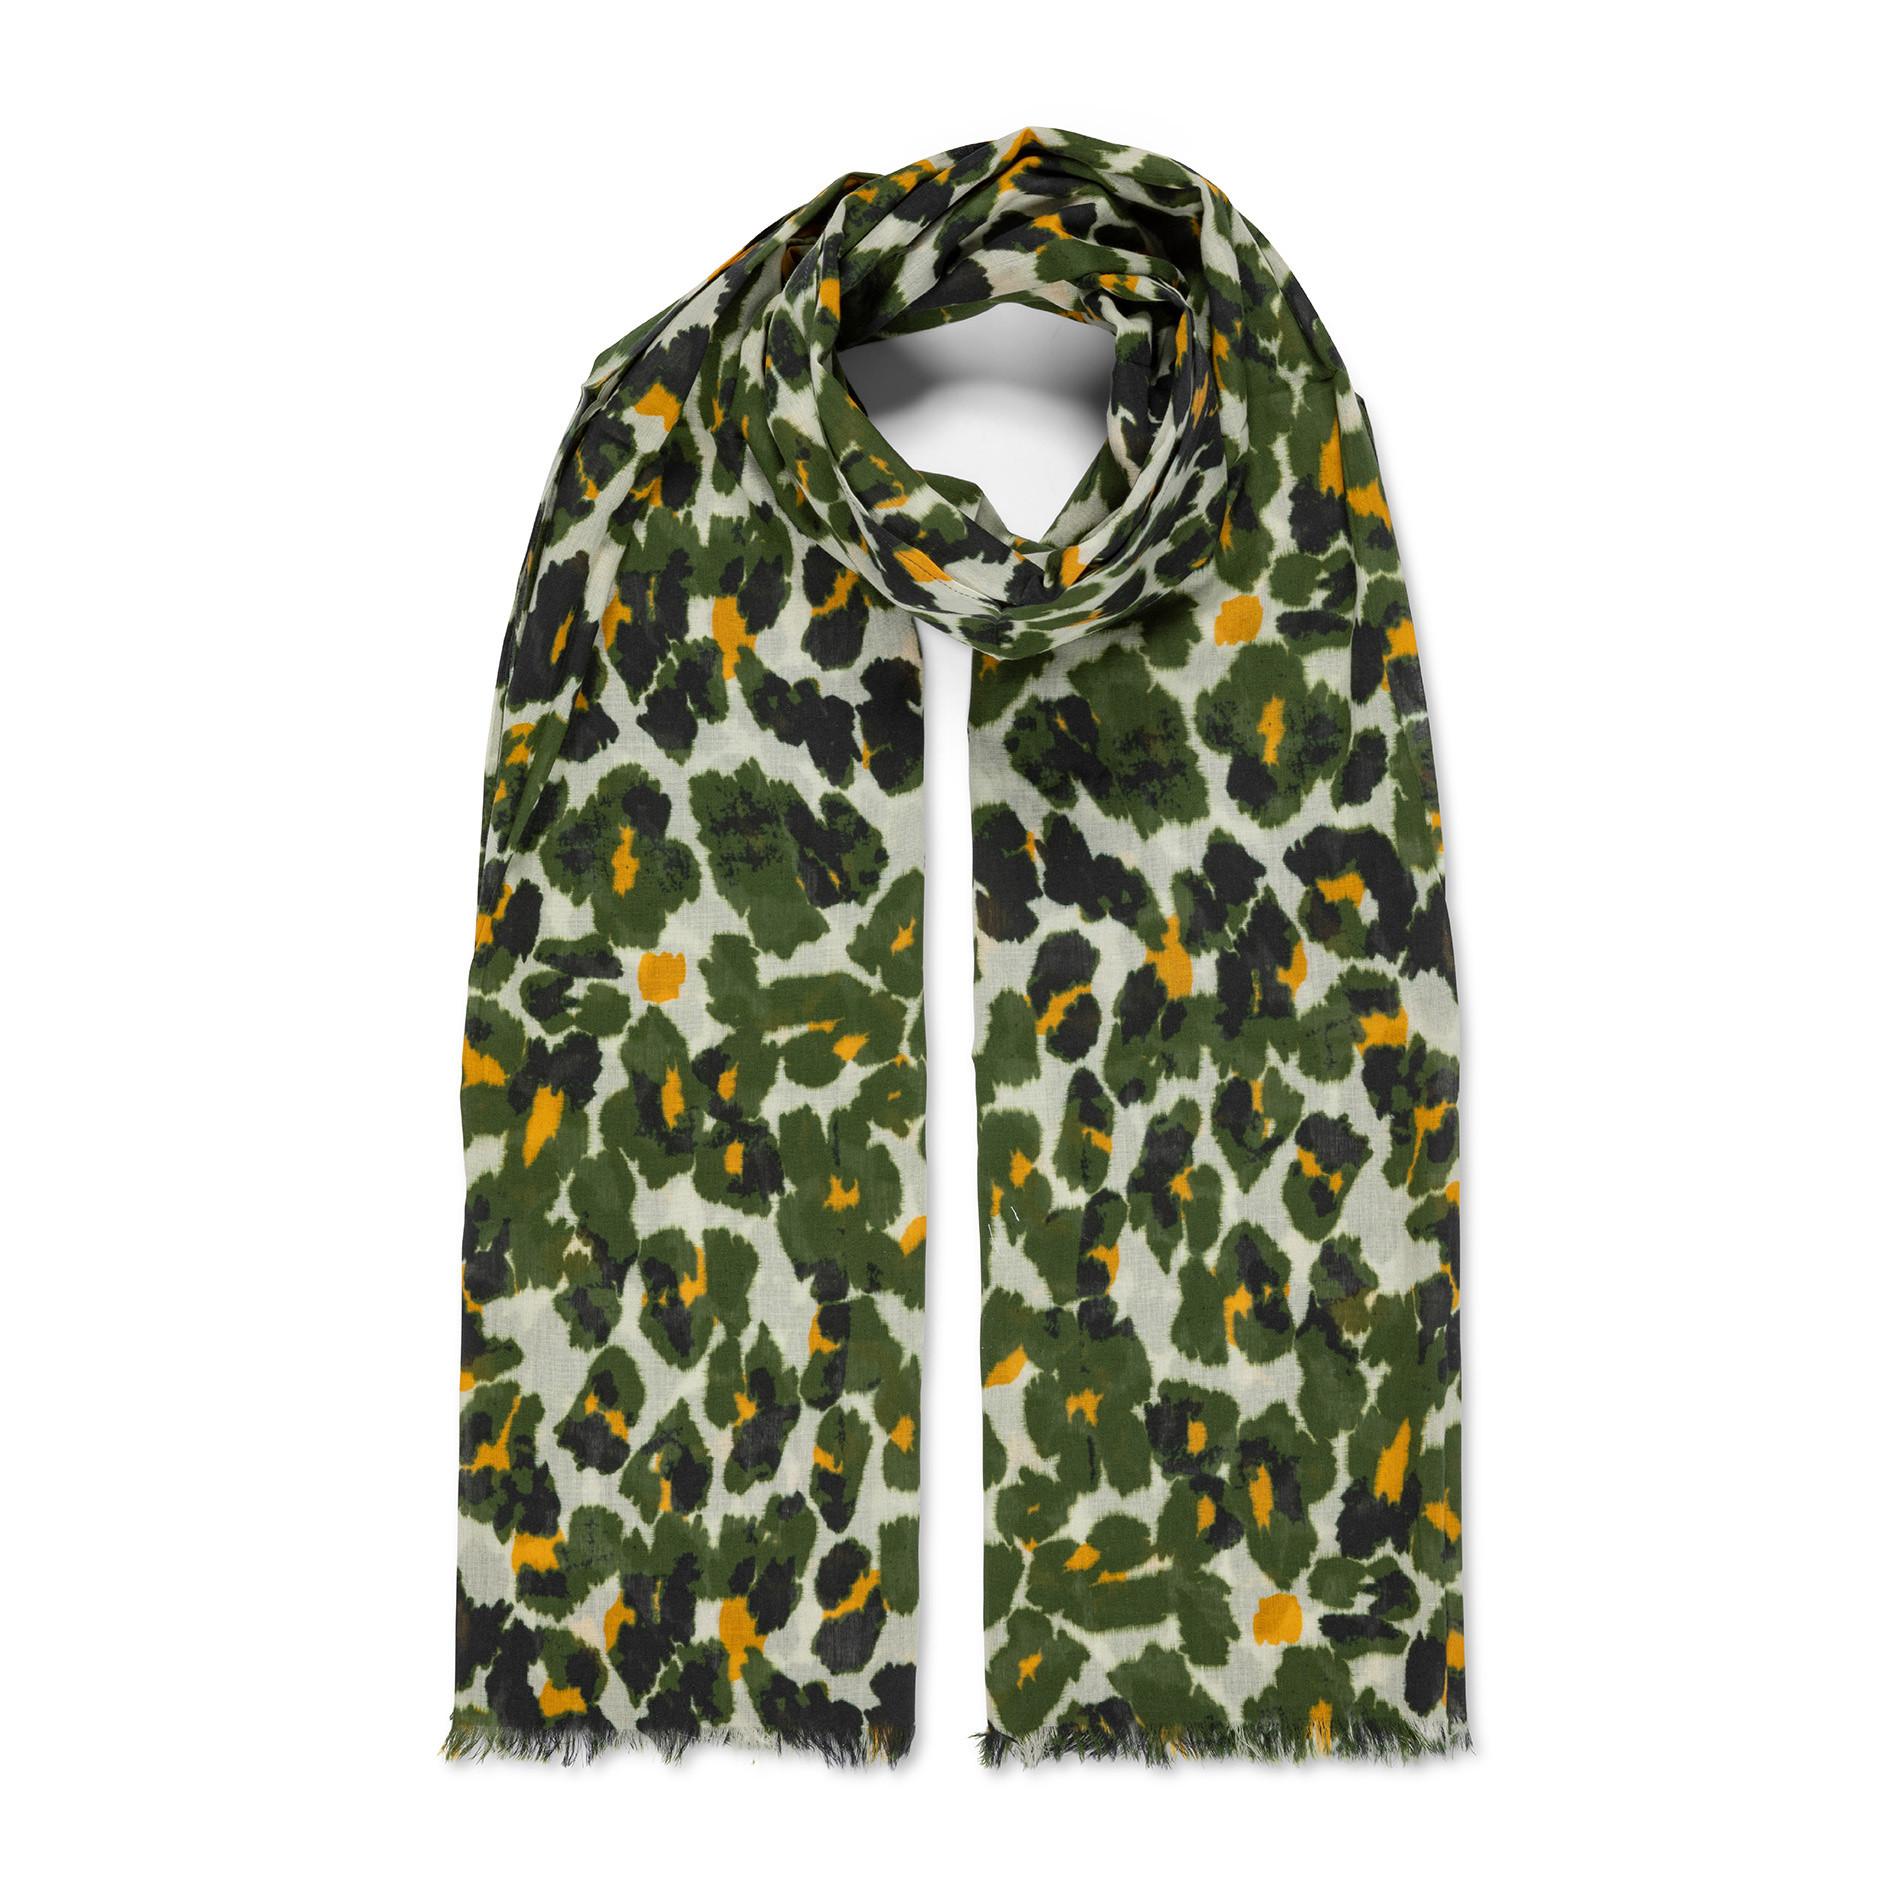 Pareo puro cotone stampa animalier Koan, Verde scuro, large image number 1